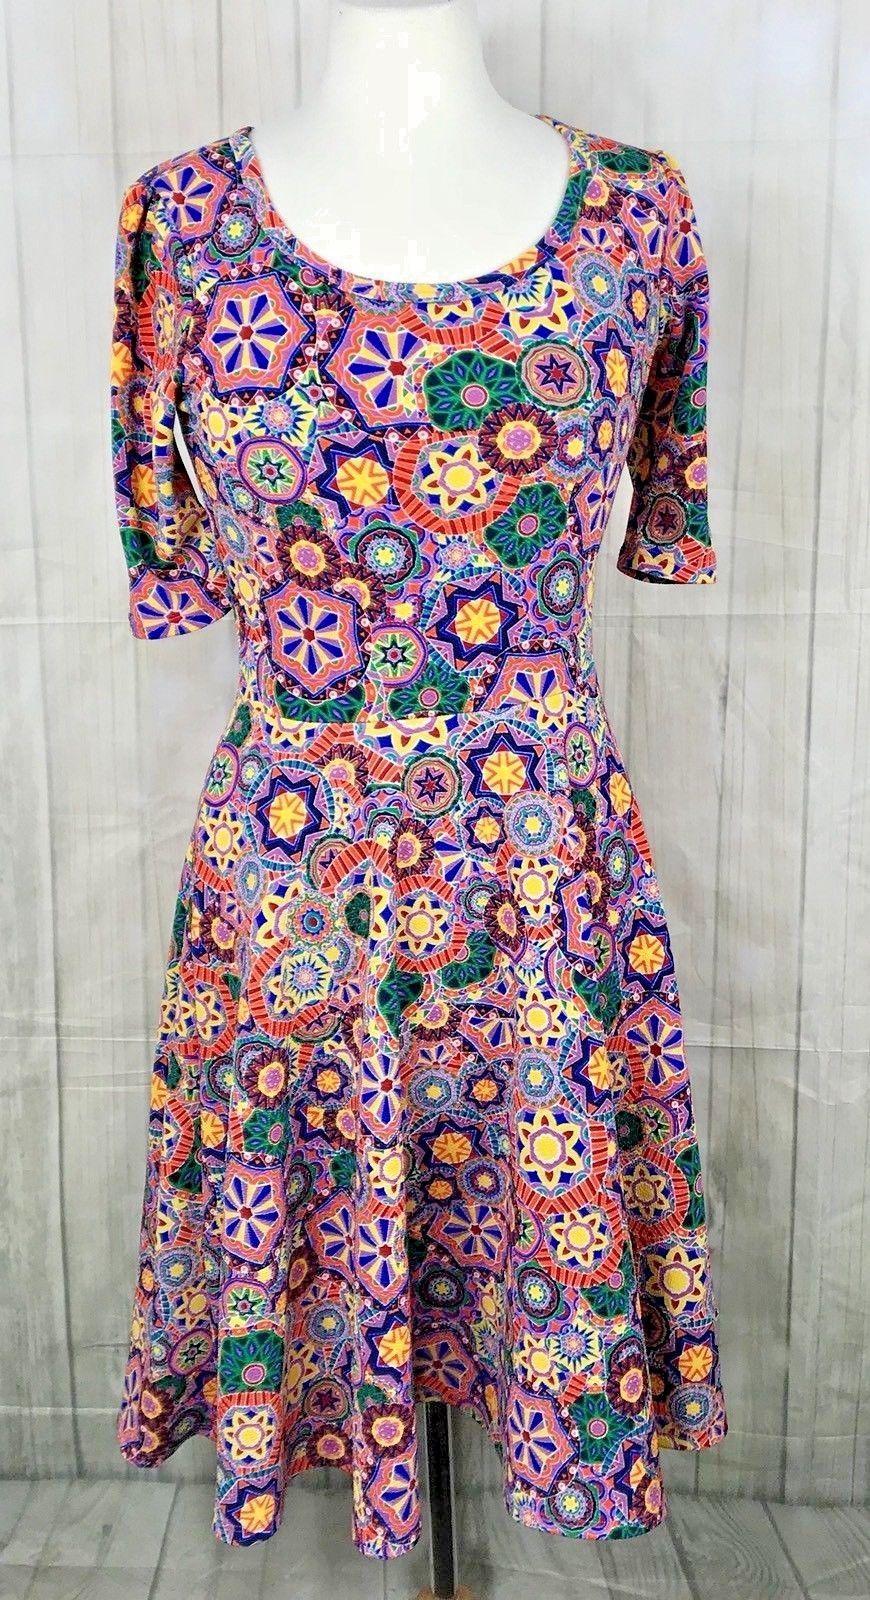 Lularoe Amelia Dress Mandala Bright Swing Sz Small - $38.79